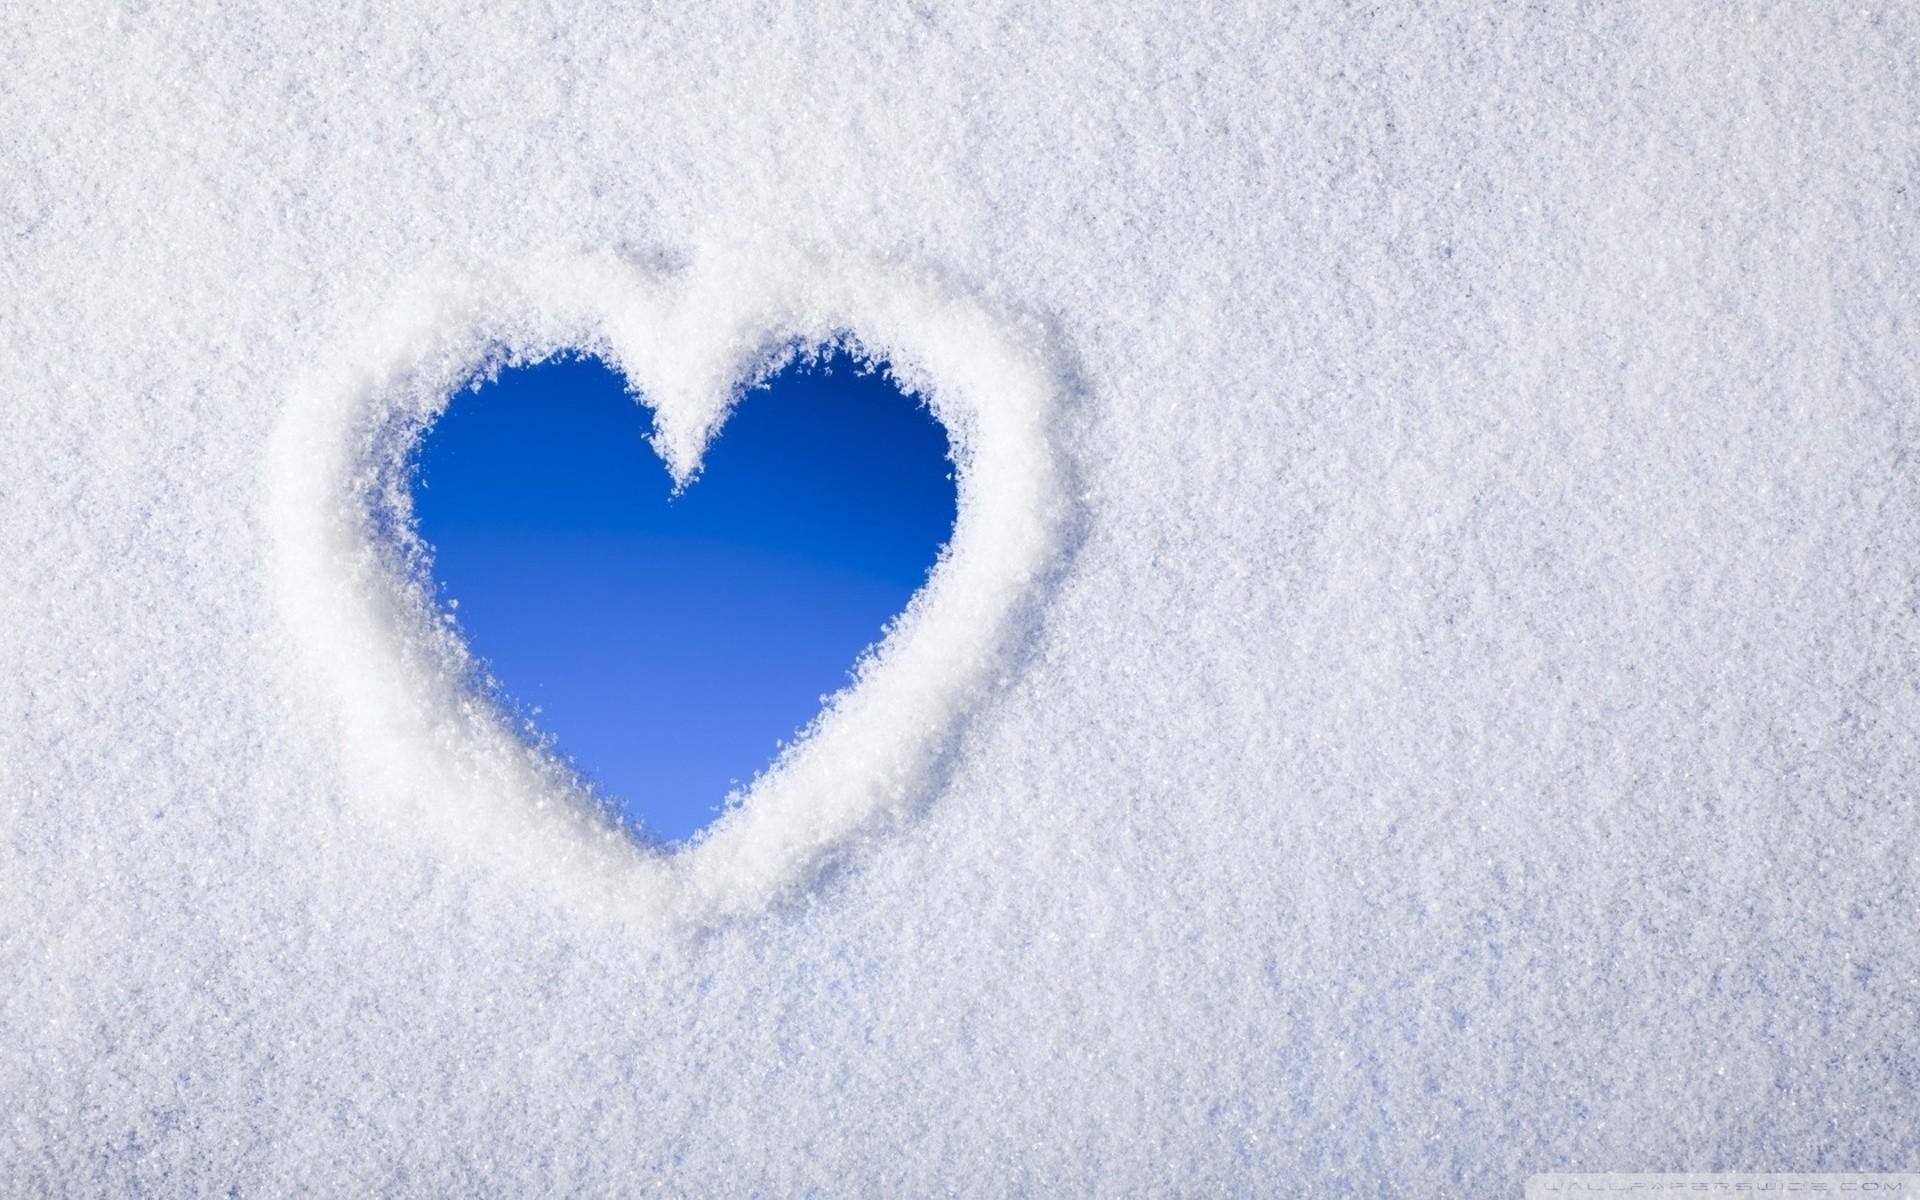 Snow Love HD Wide Wallpaper for Widescreen